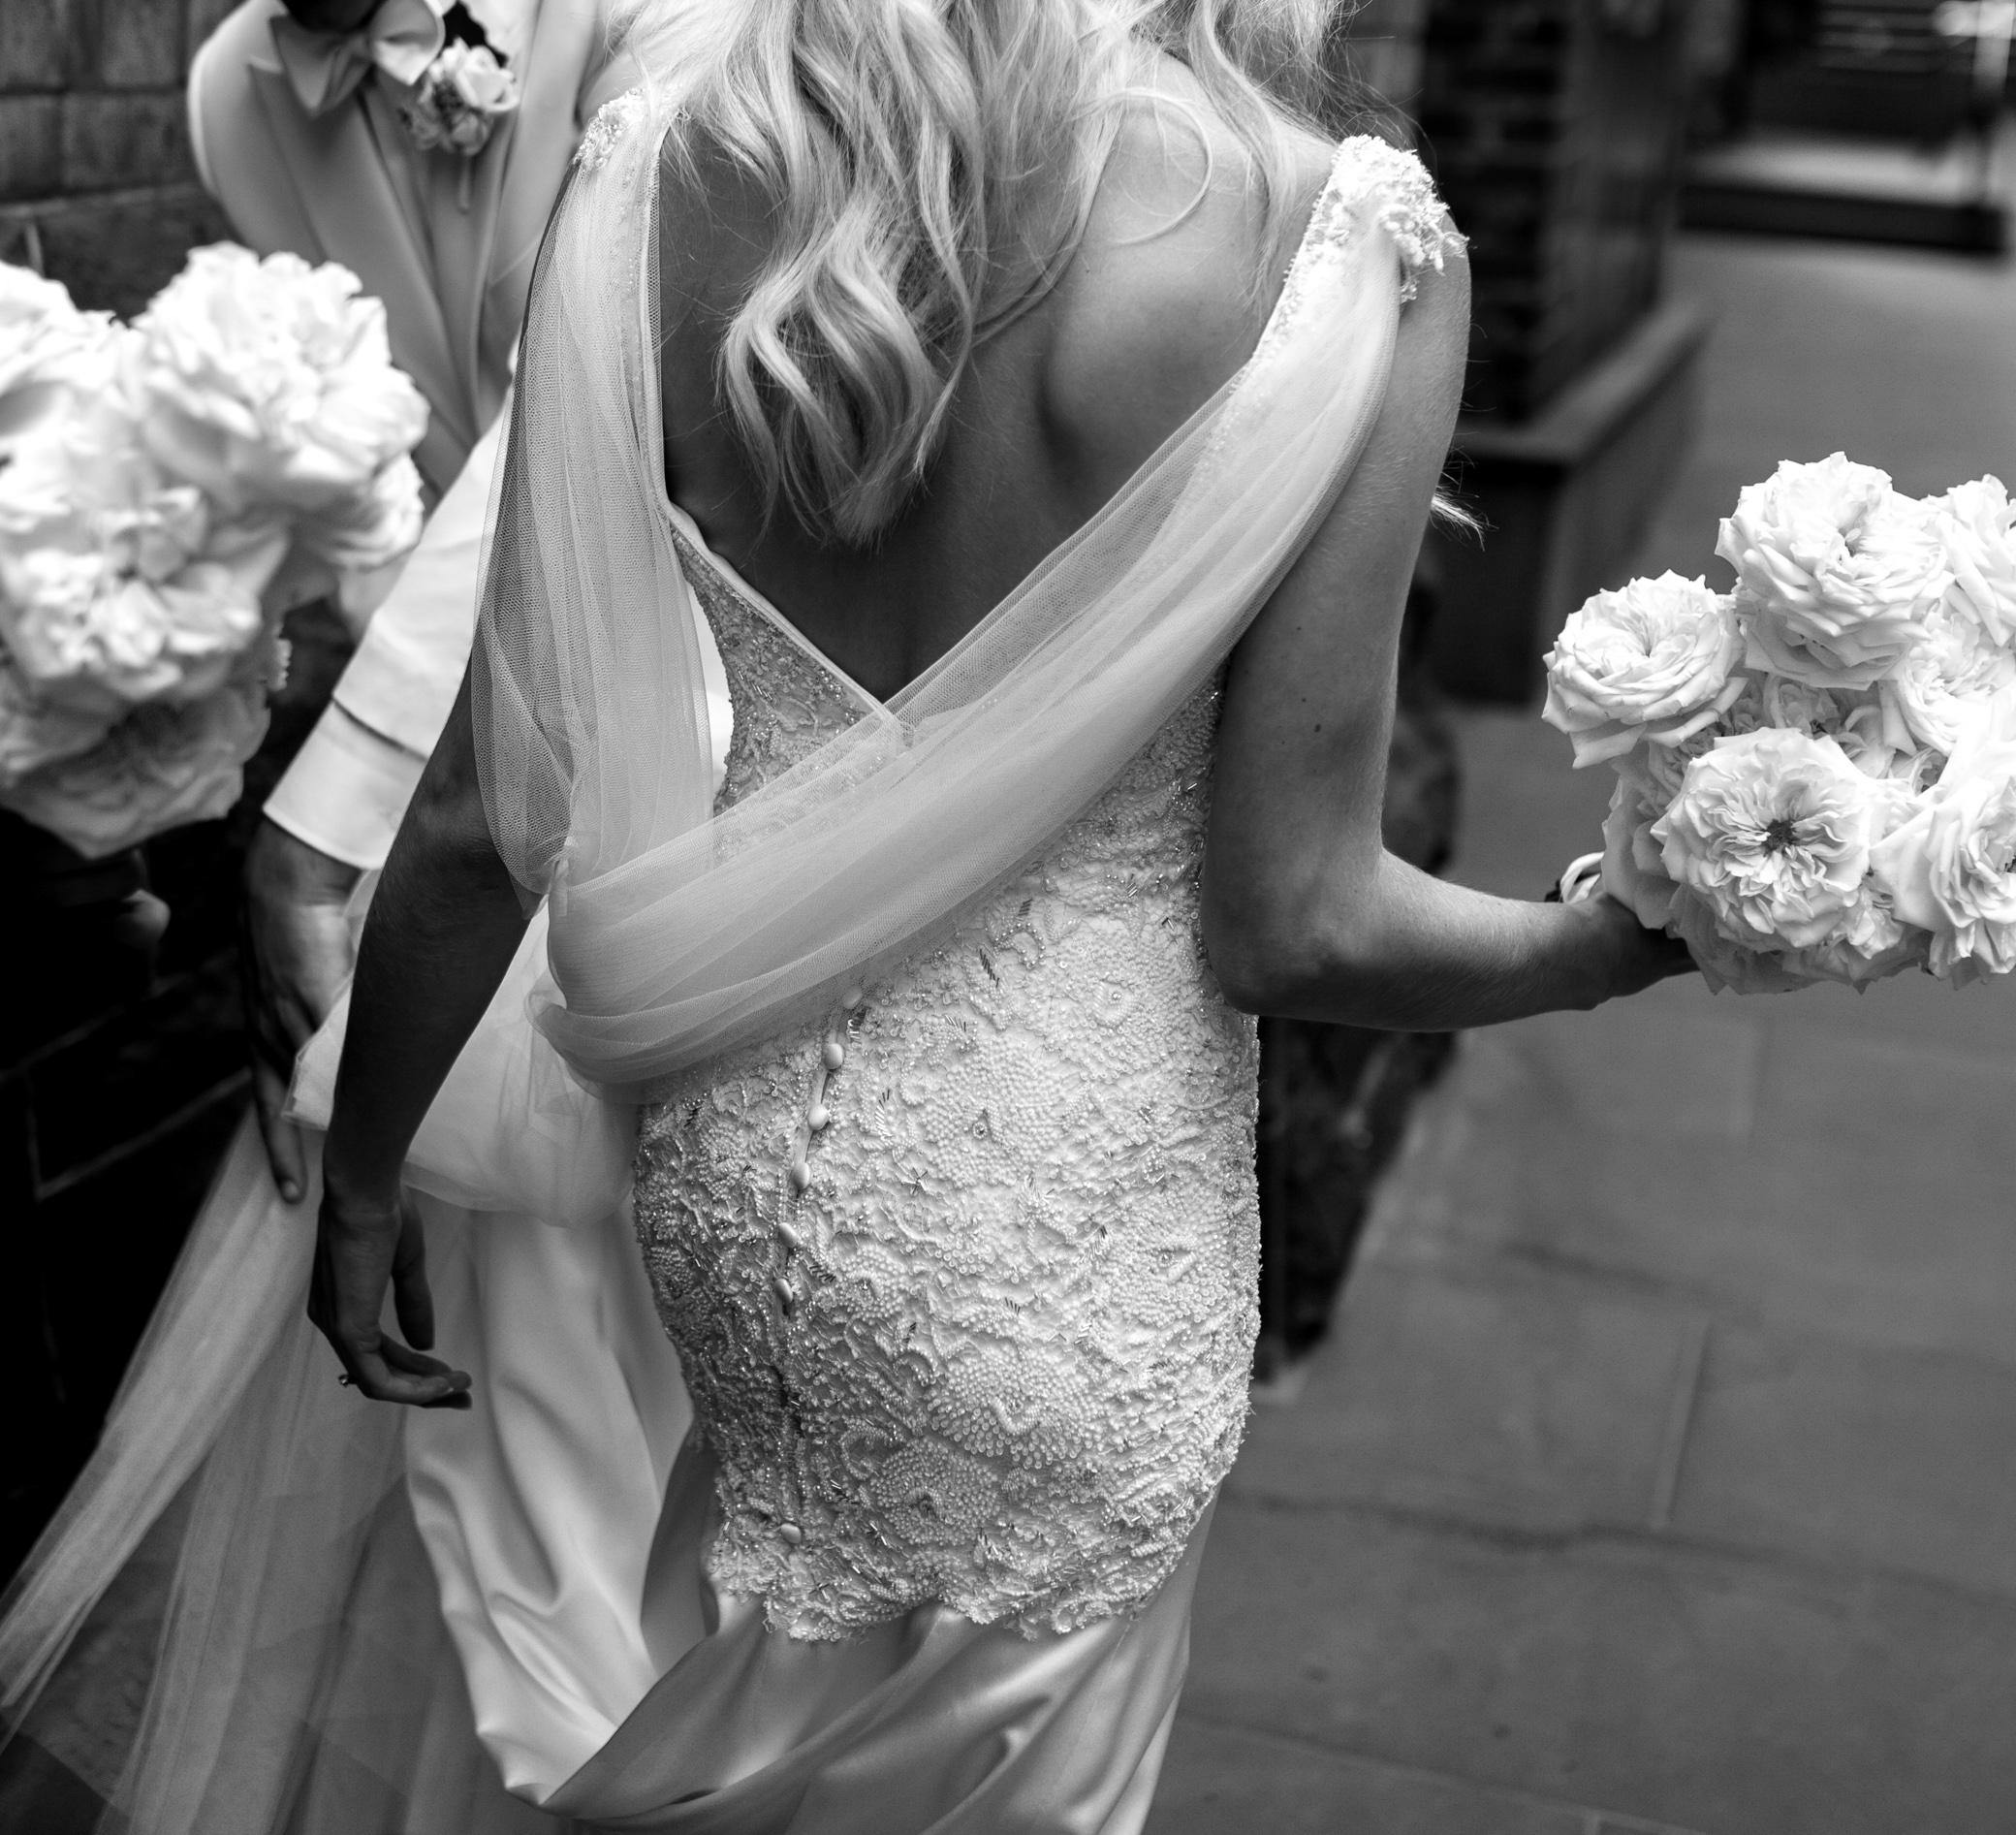 mr-theodore_white-vine-photography_same-sex-wedding-directory15.jpg